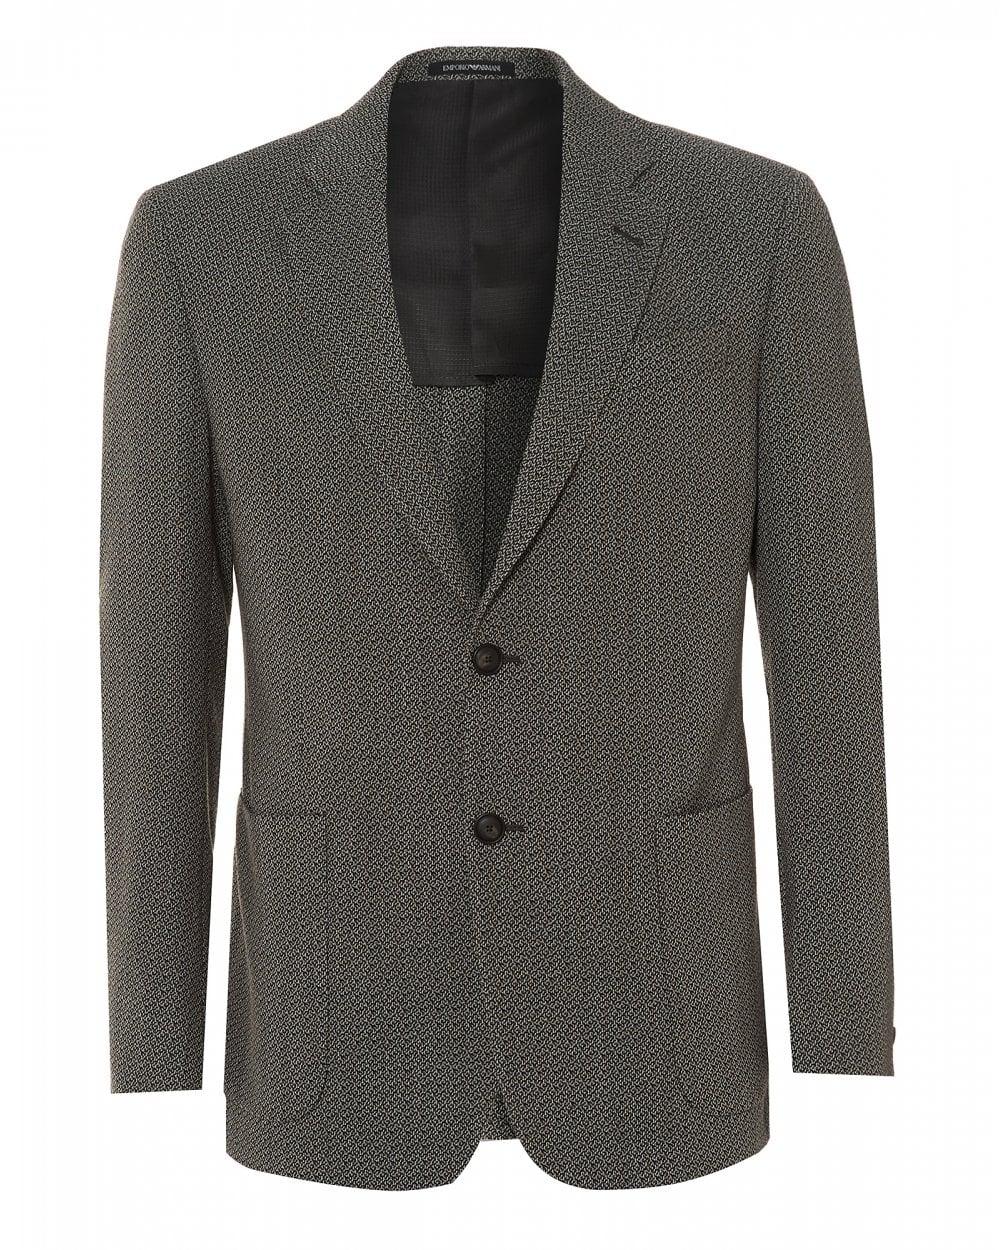 caldo-vendita doppio coupon servizio duraturo Emporio Armani Mens Weaved Patch Blazer, Grey Regular Fit Jacket